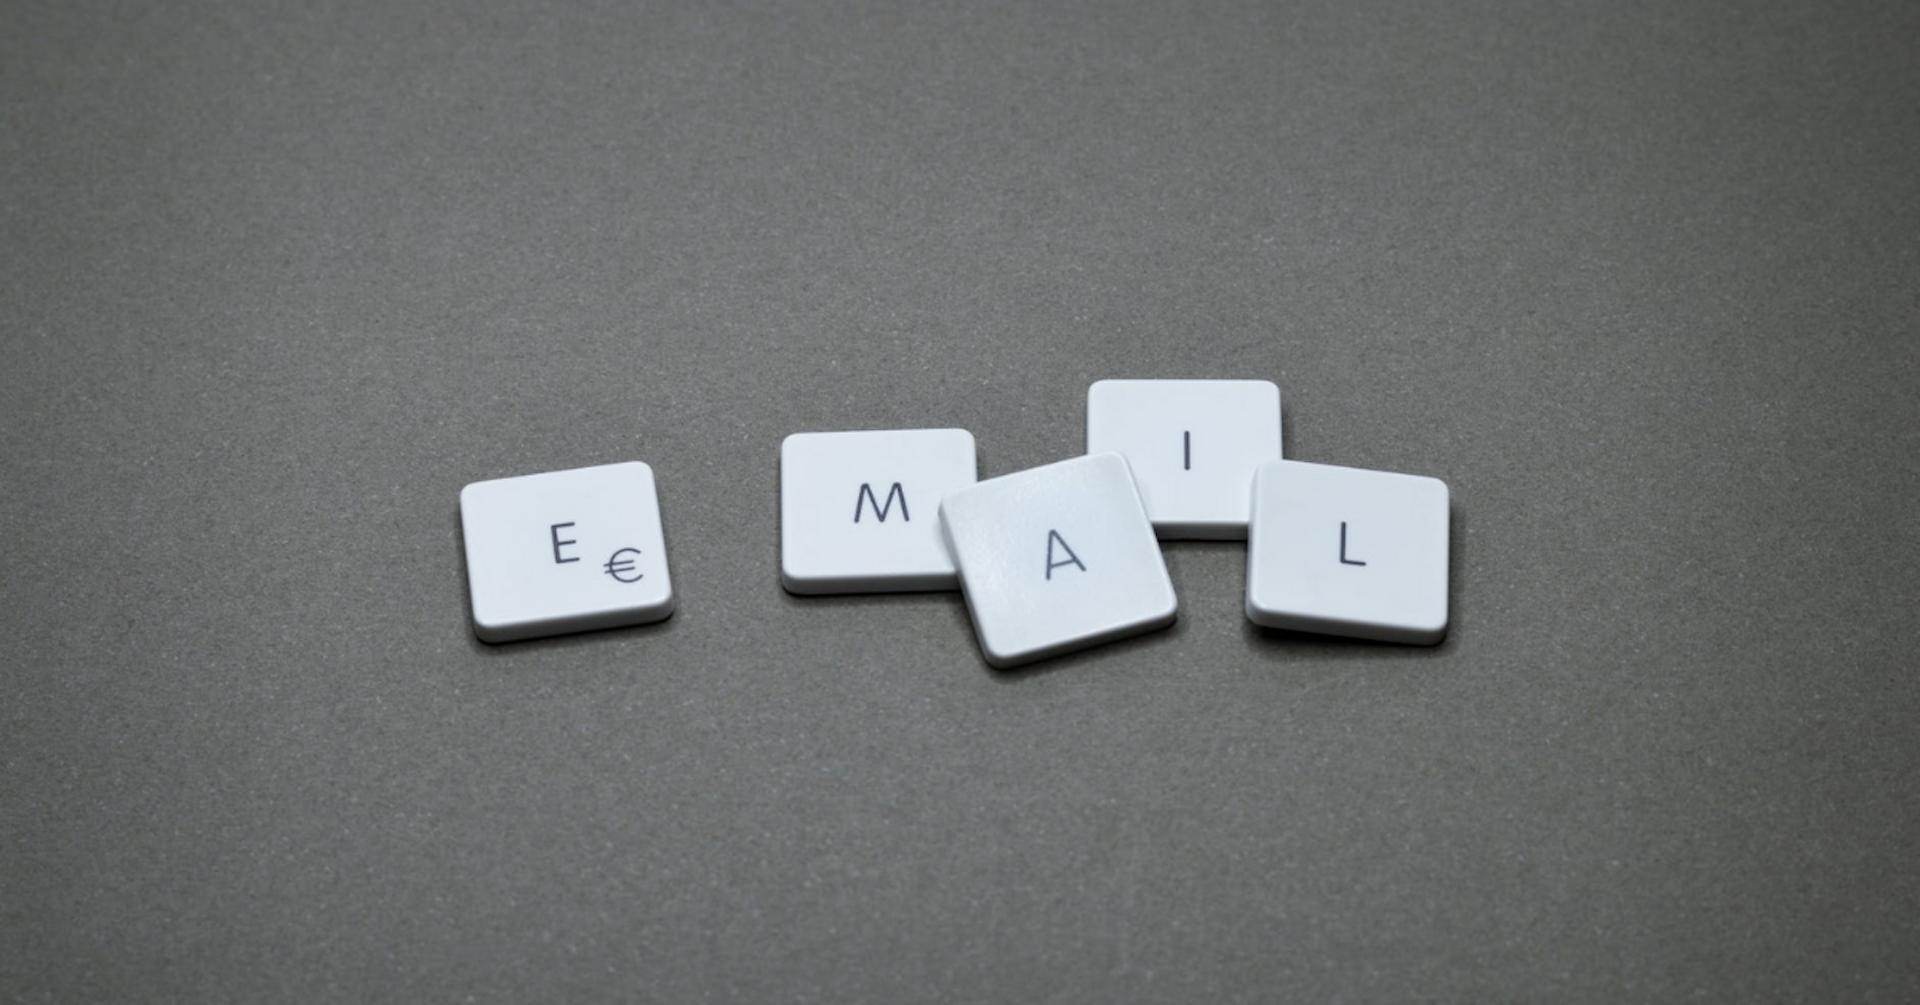 Las 5 mejores alternativas a Mailchimp para tu marca